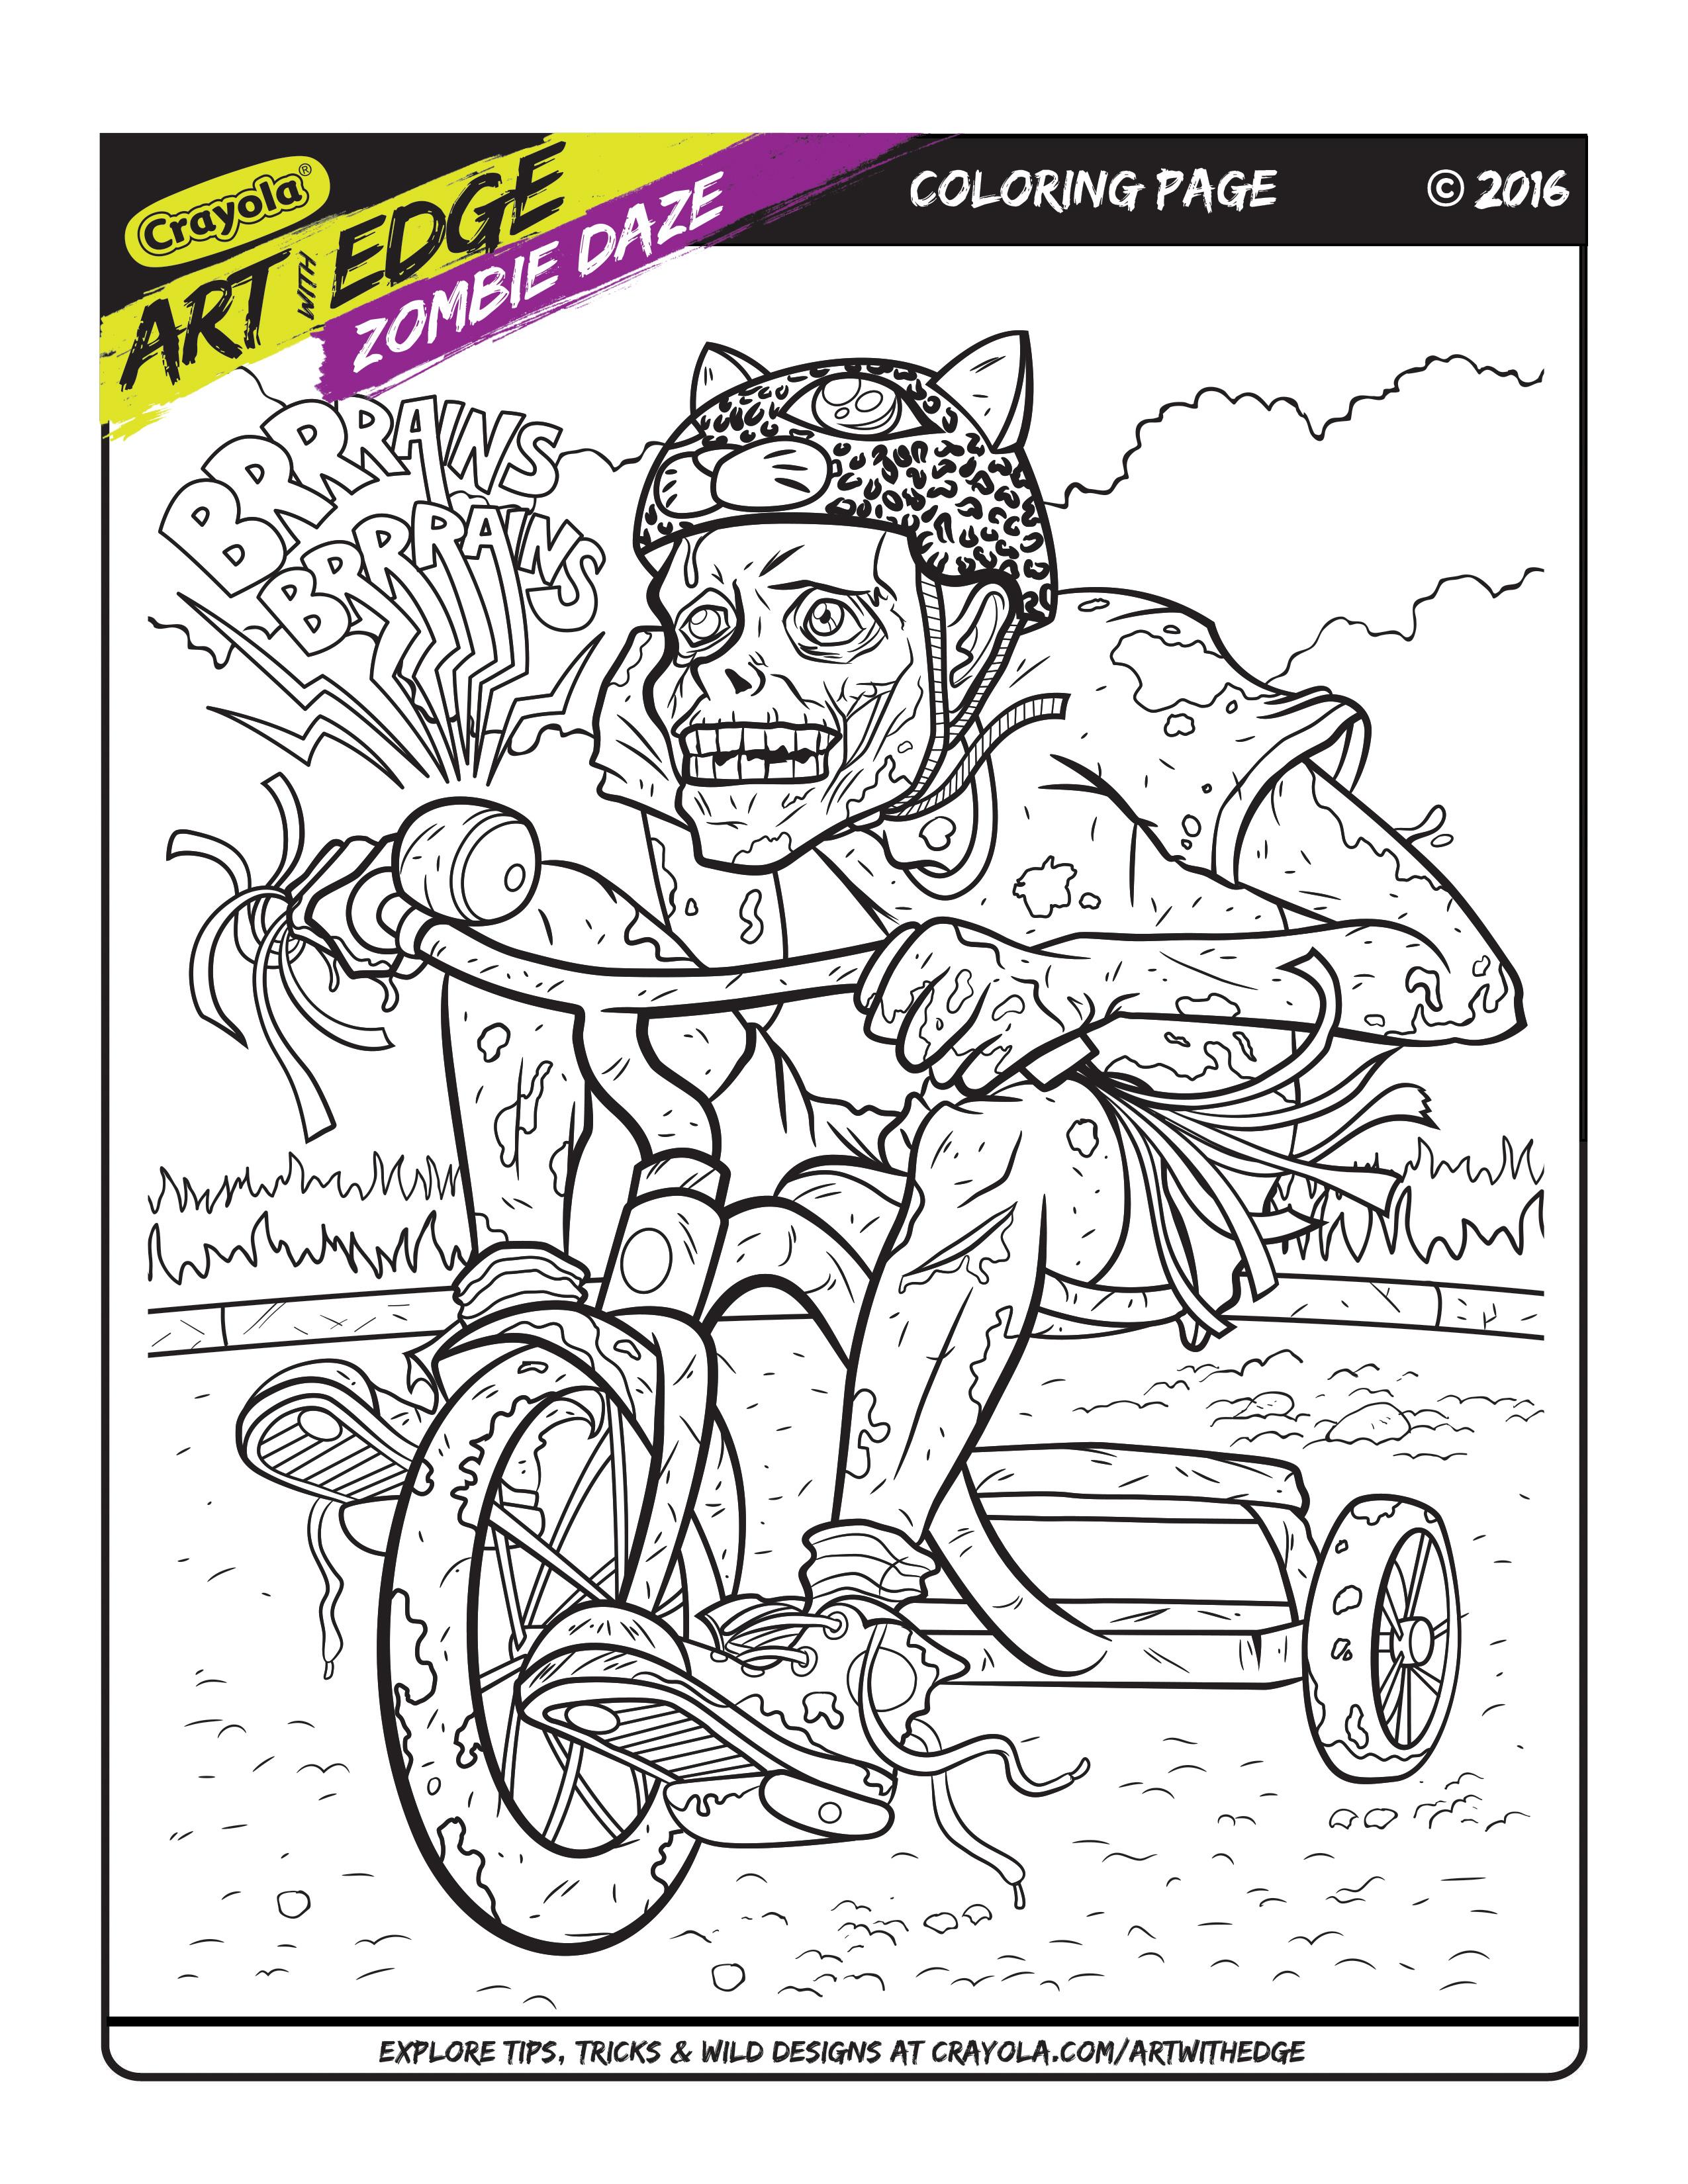 Art With Edge Zombie Daze Coloring Page Crayola.com